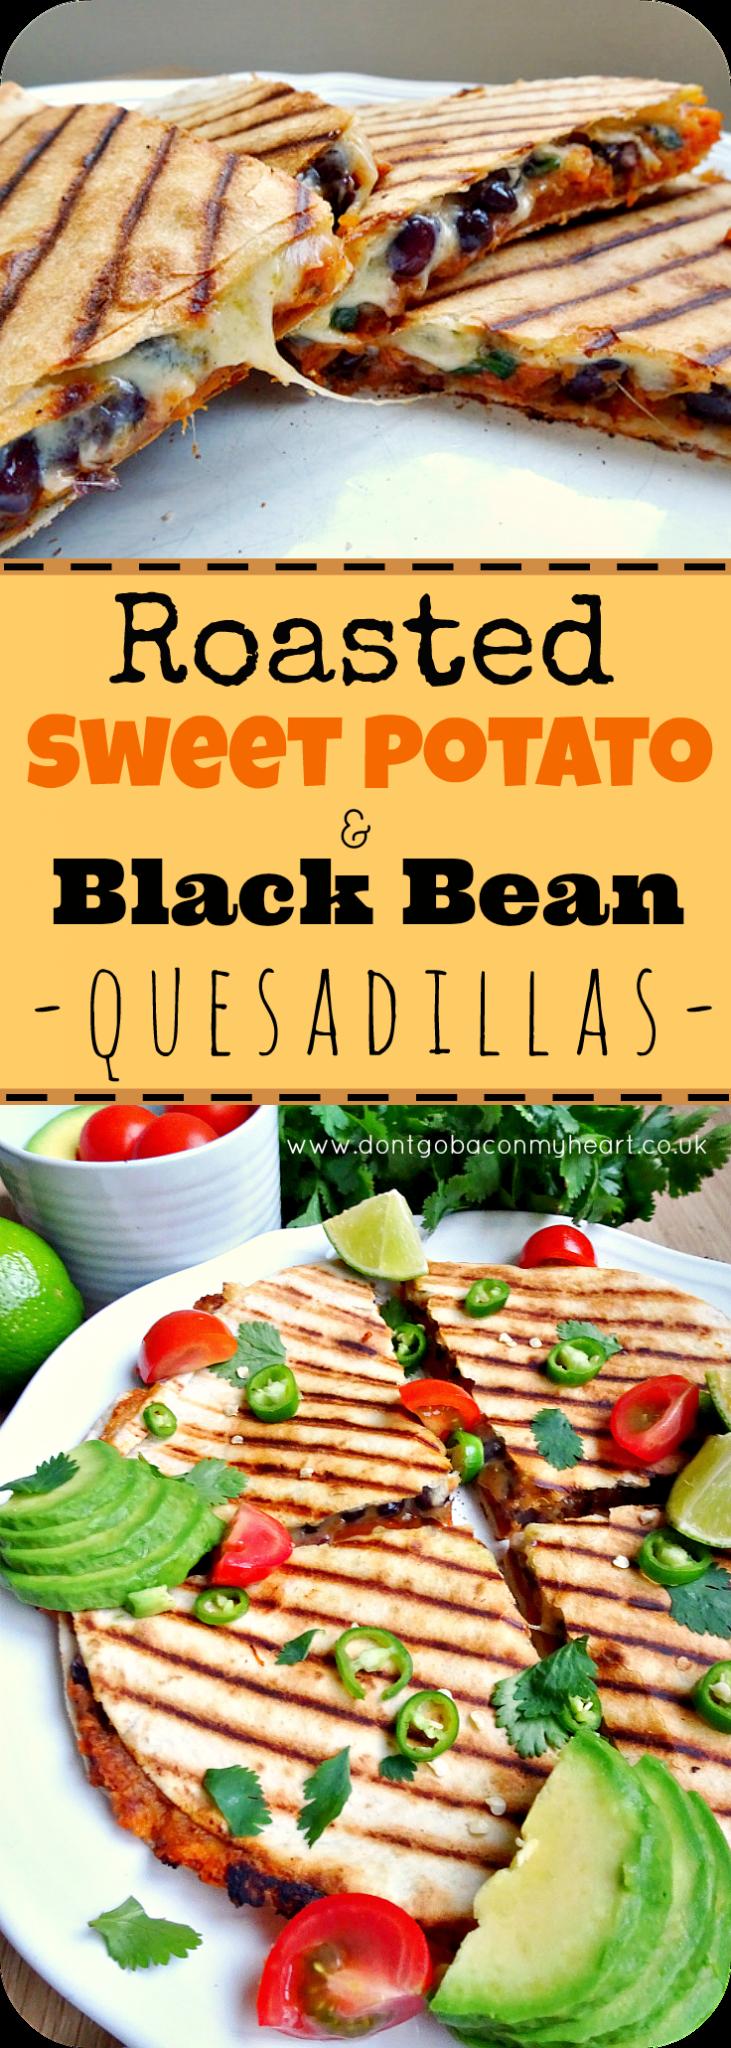 Sweet Potato and Black Bean Quesadillas | Don't Go Bacon My Heart